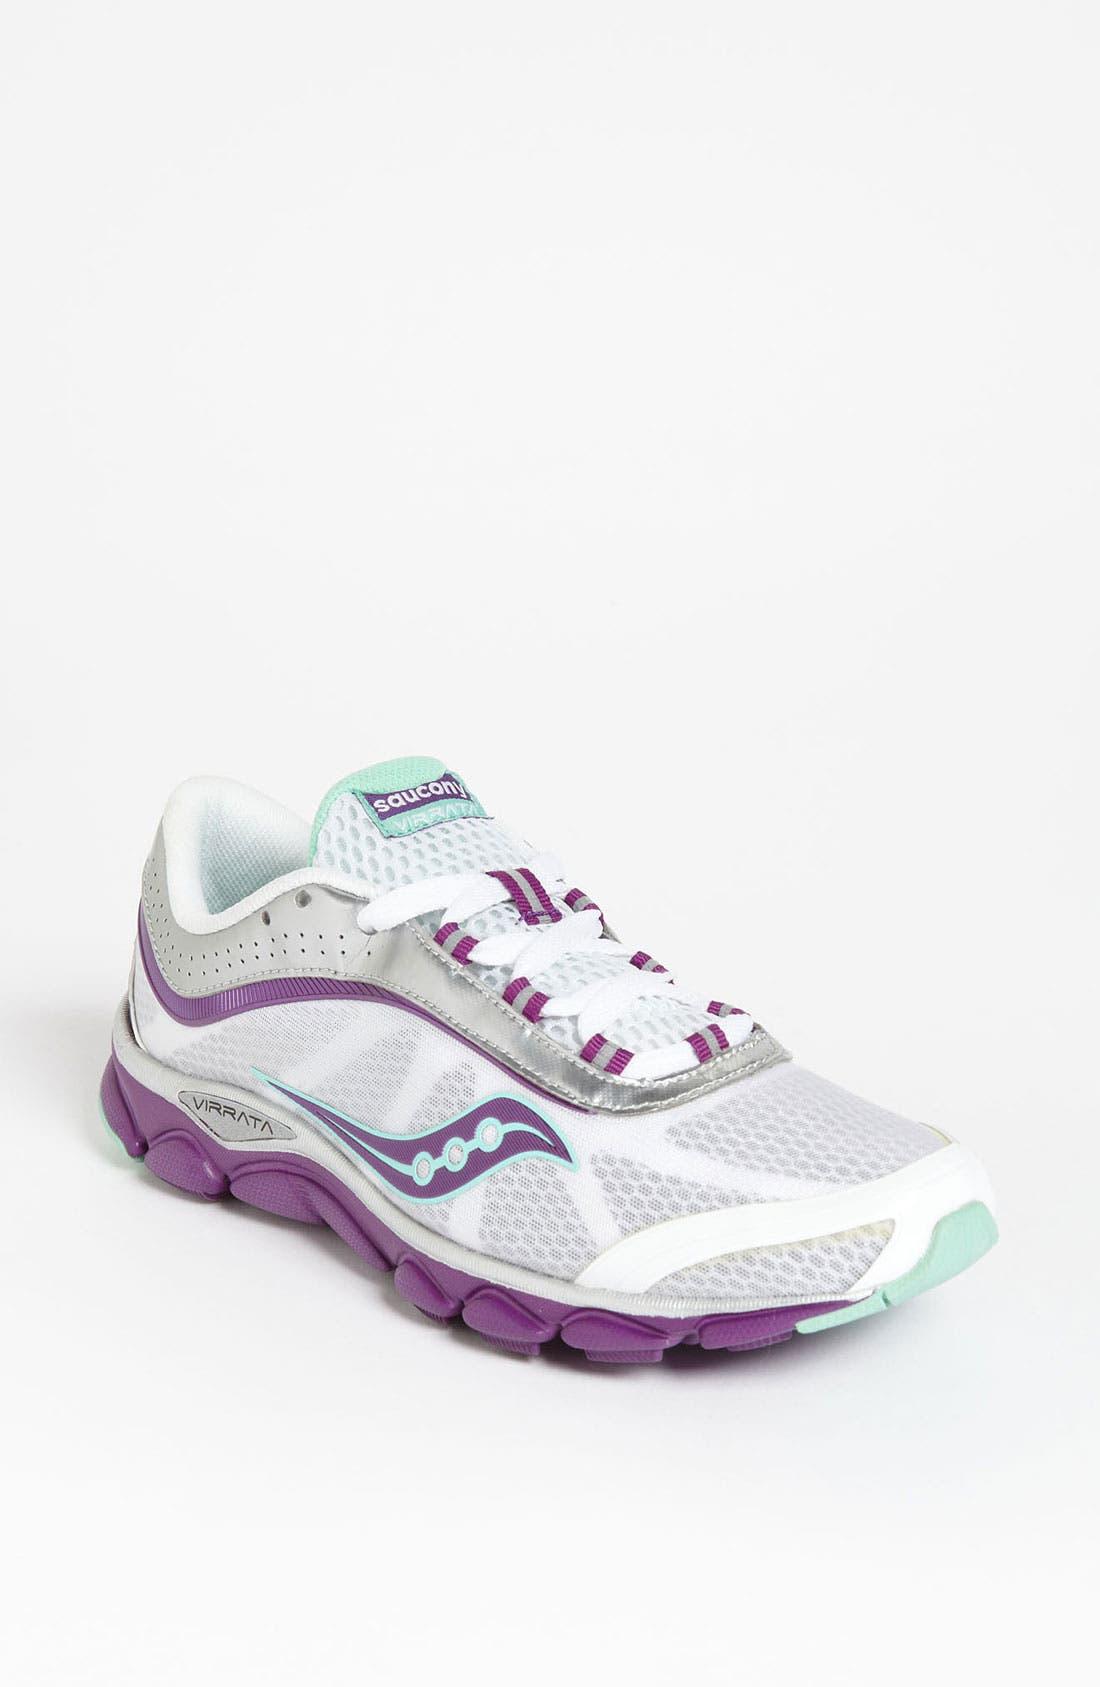 Main Image - Saucony 'Virrata' Running Shoe (Women)(Regular Retail Price: $89.95)